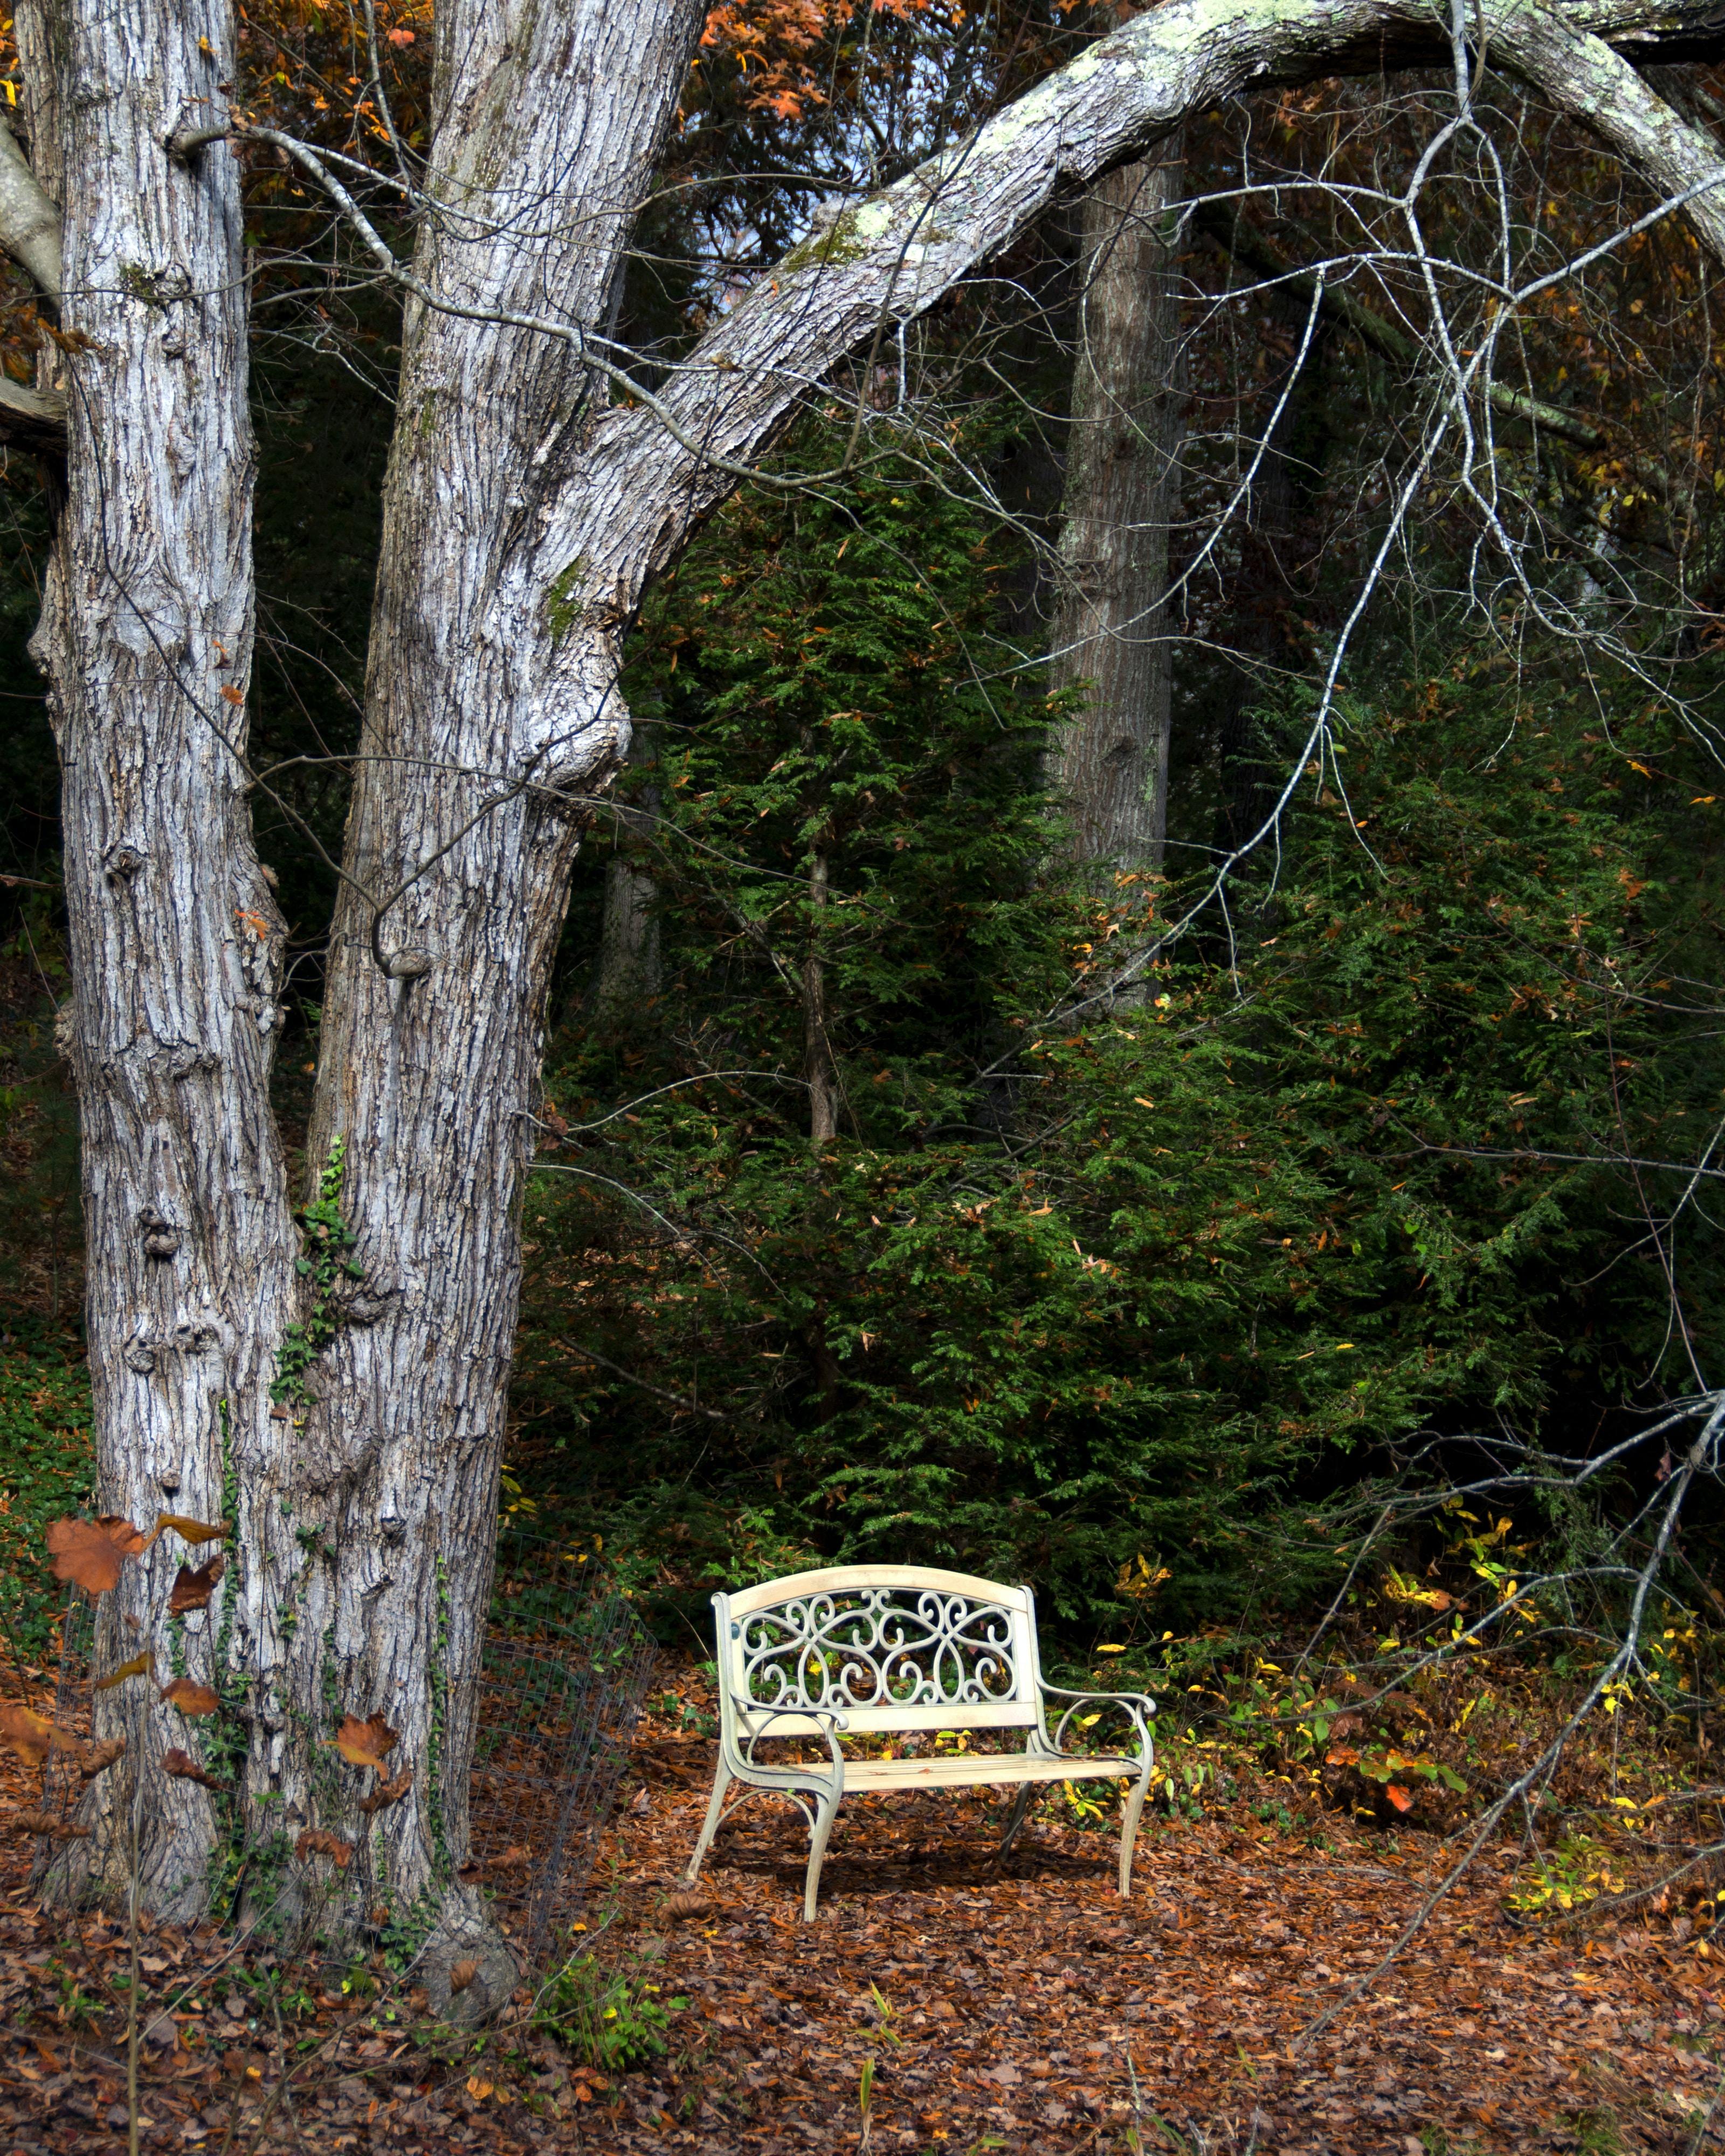 white steel bench under tree near green plants during daytime